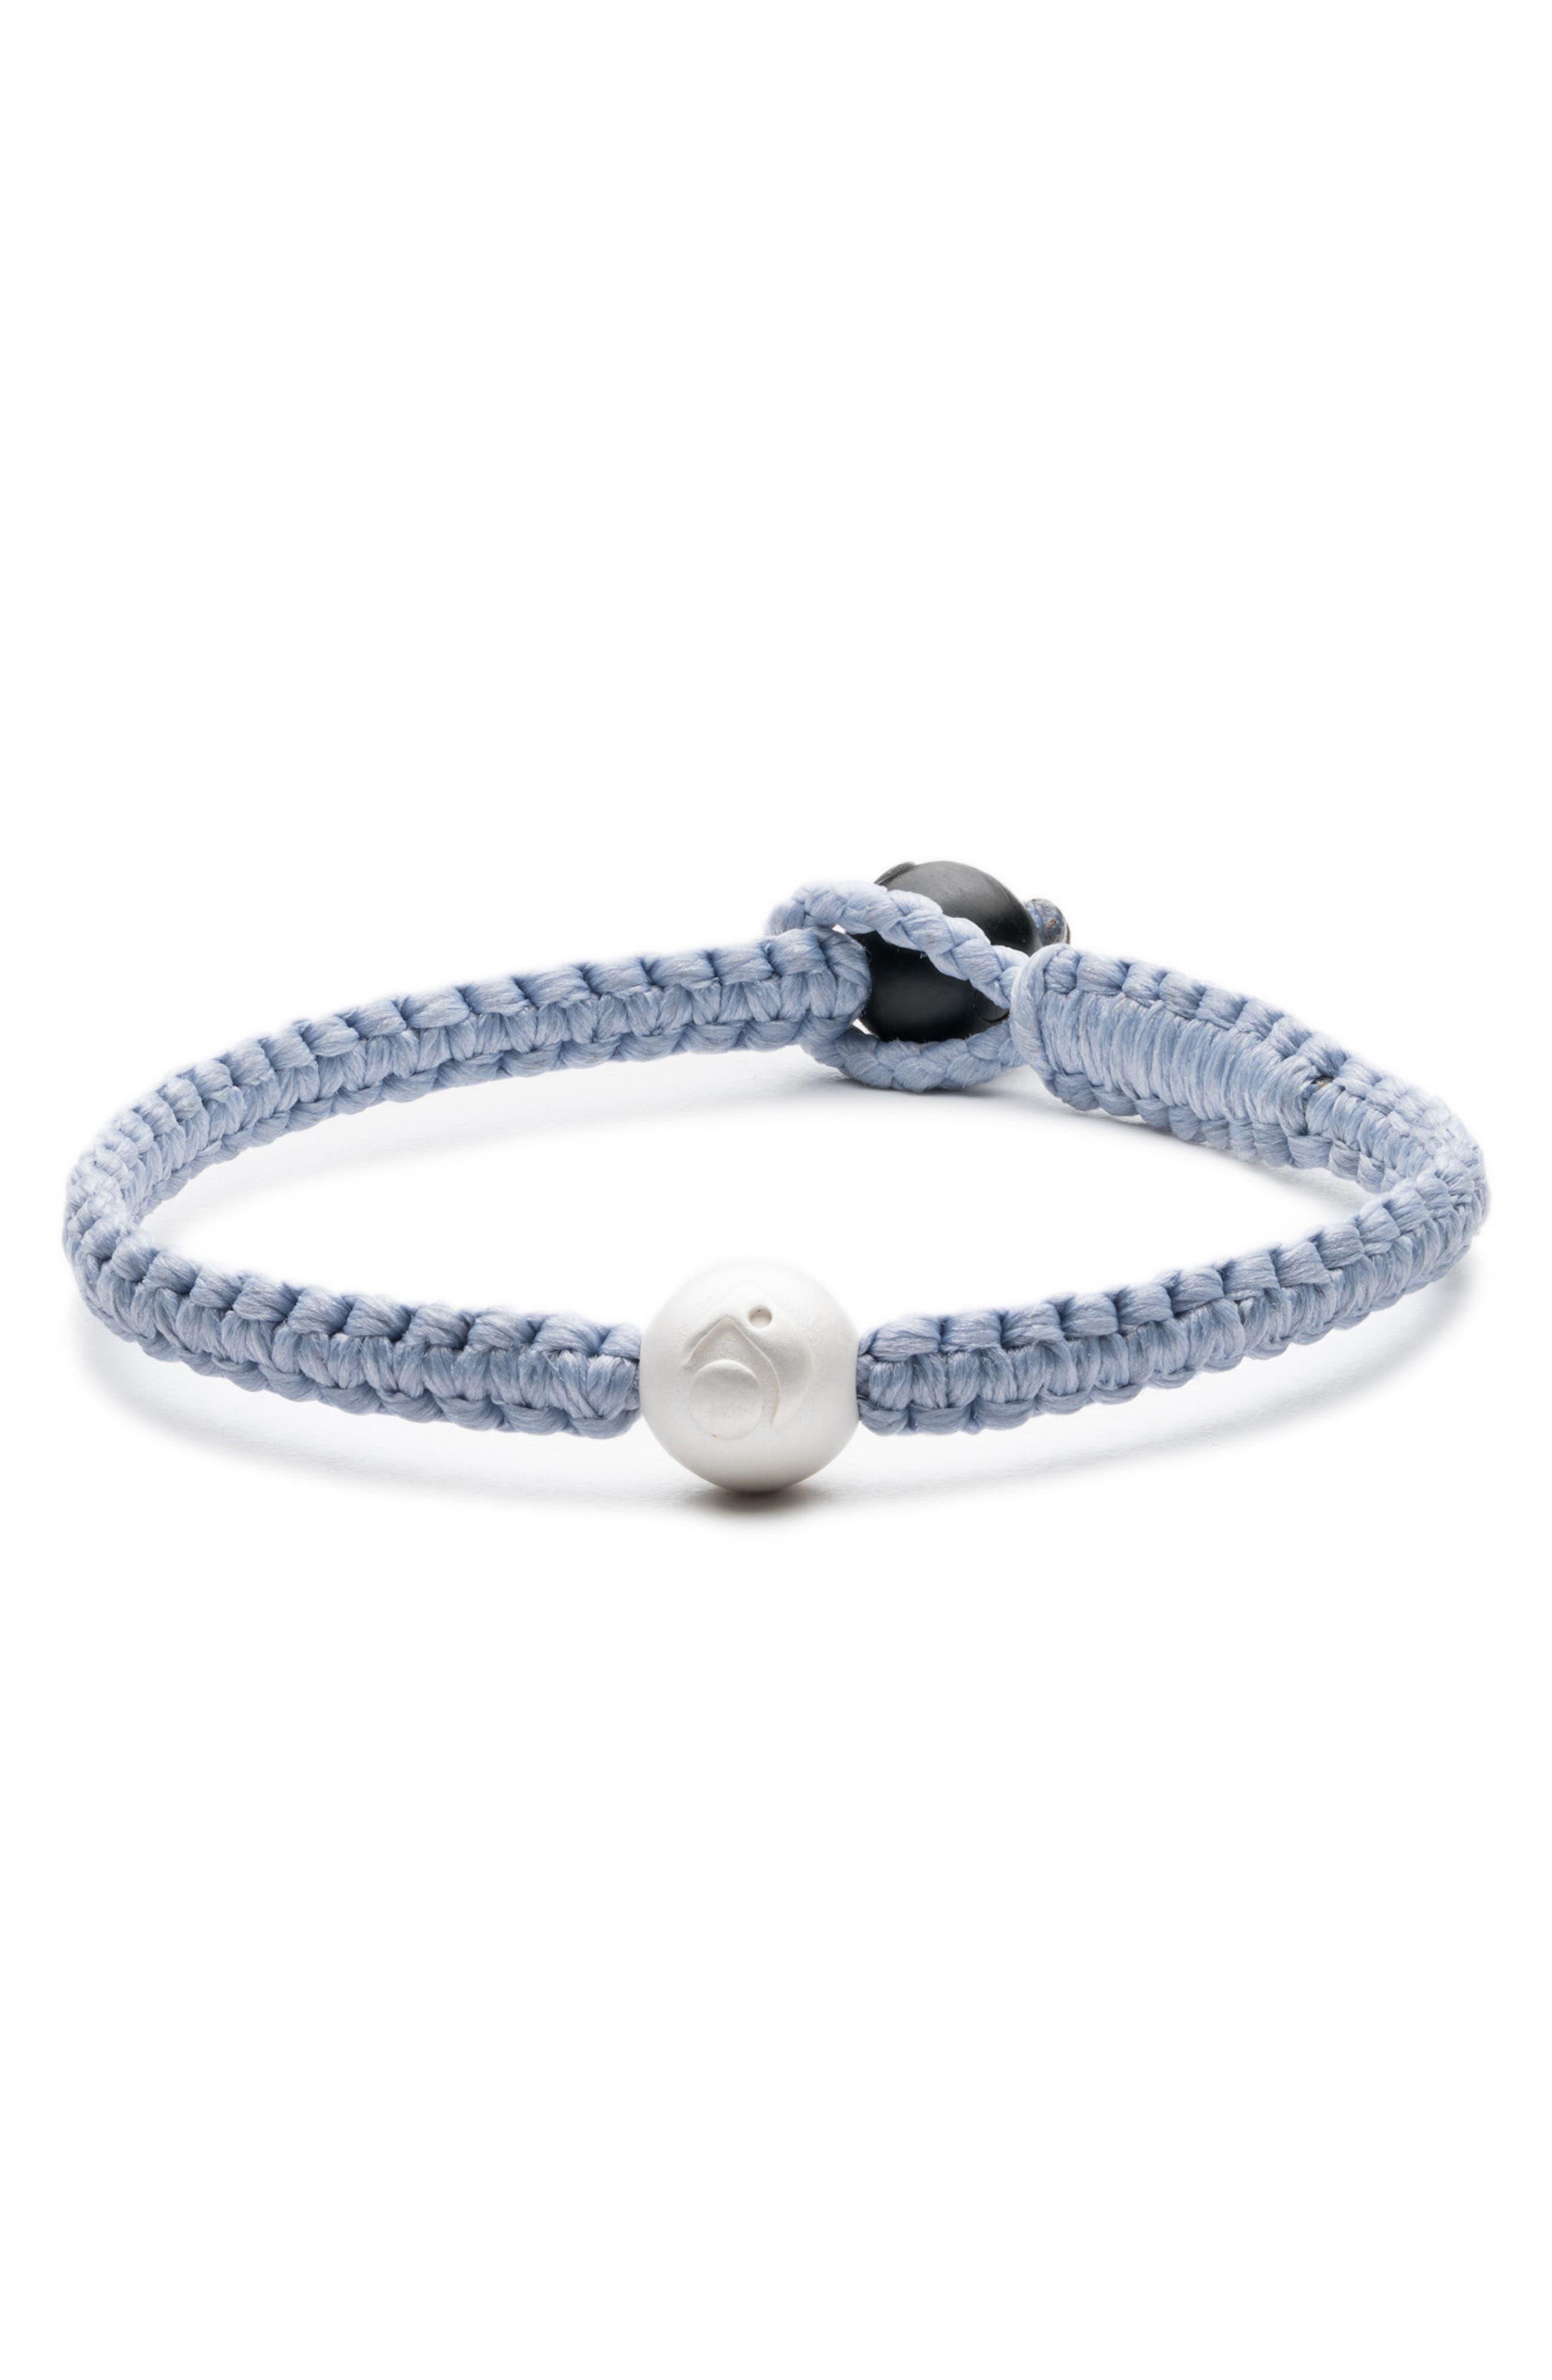 Lokai 2.0 Wrap Bracelet